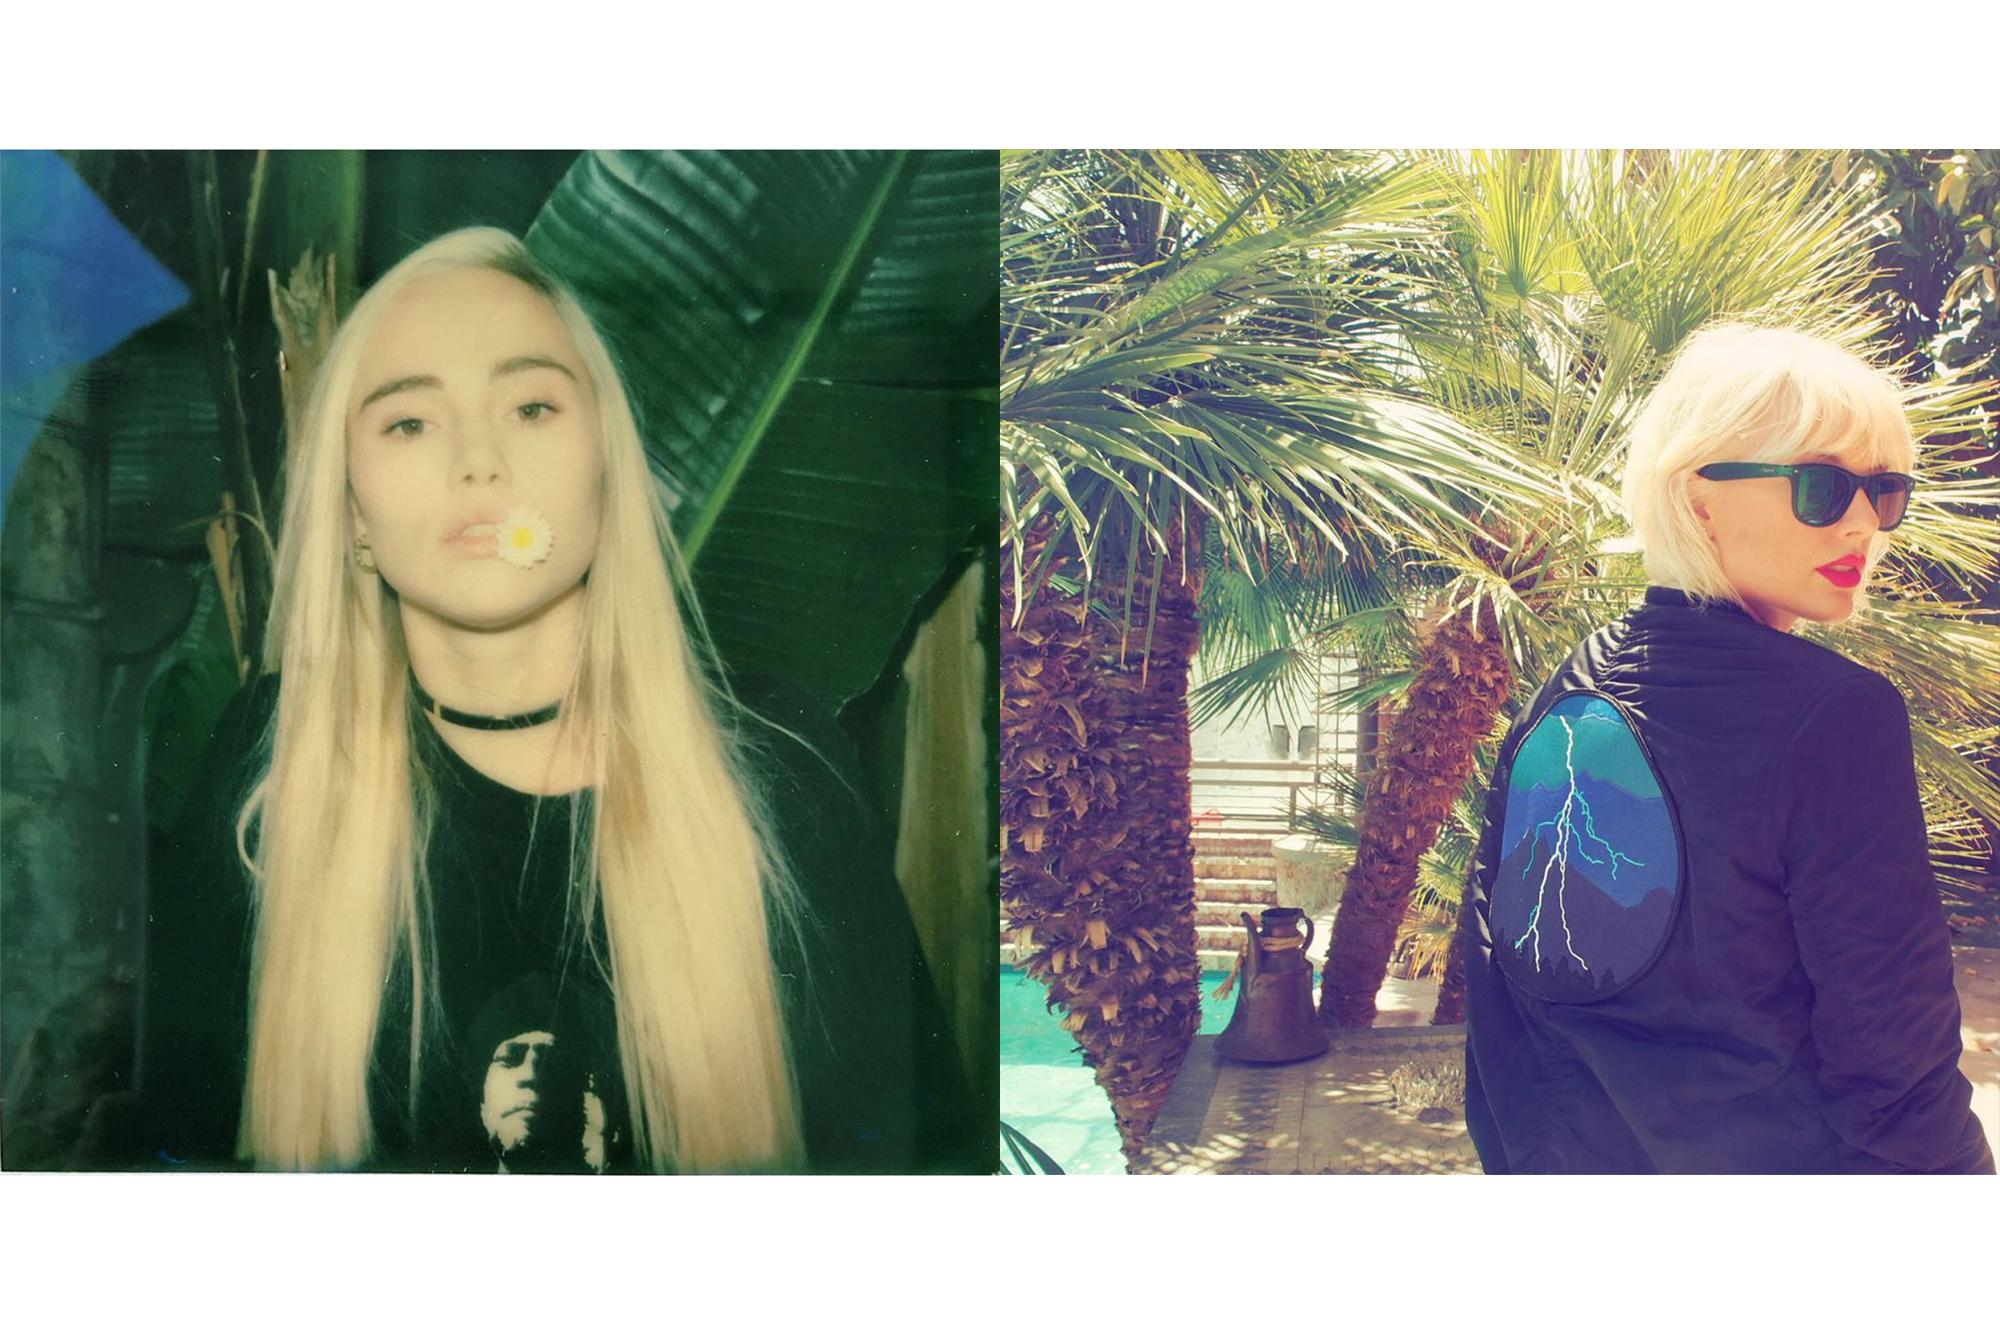 blondes lead